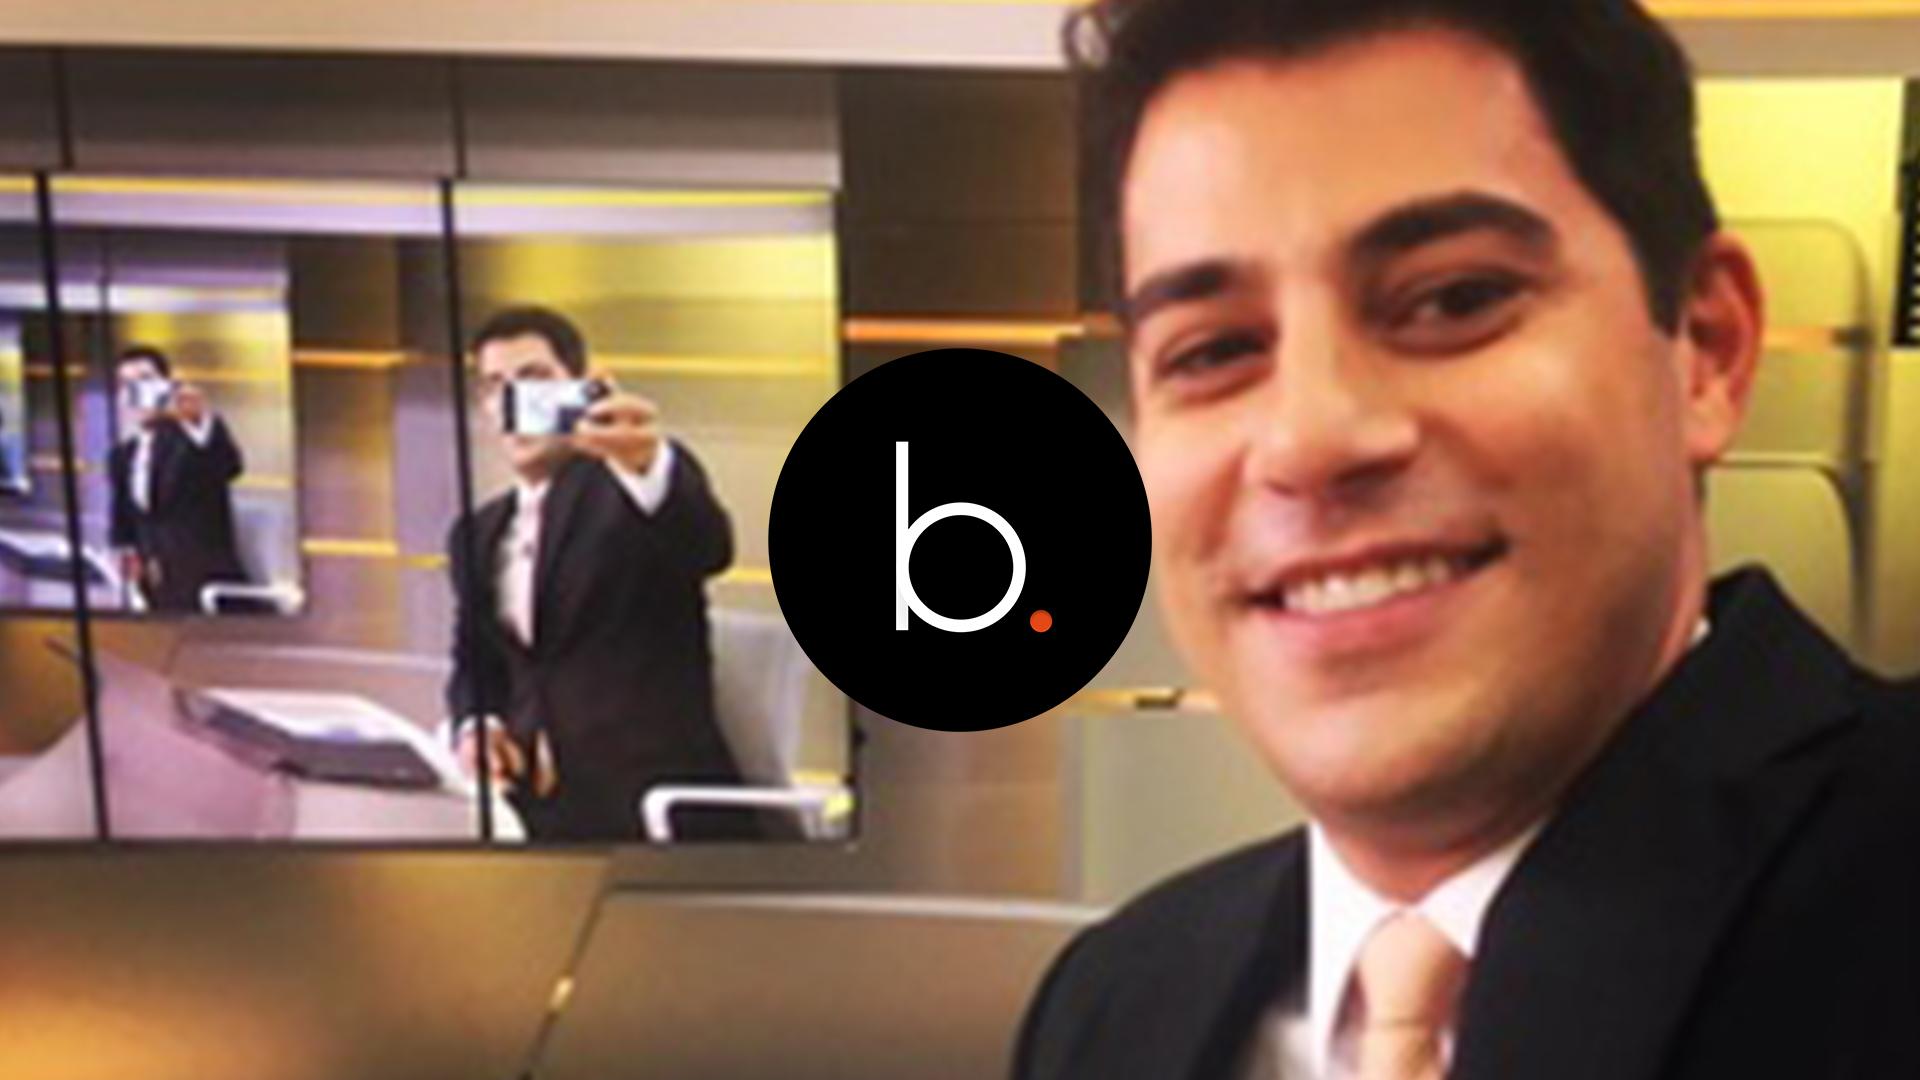 Assista: Pobre? Depois de sair da Globo Evaristo Costa aparece fazendo faxina